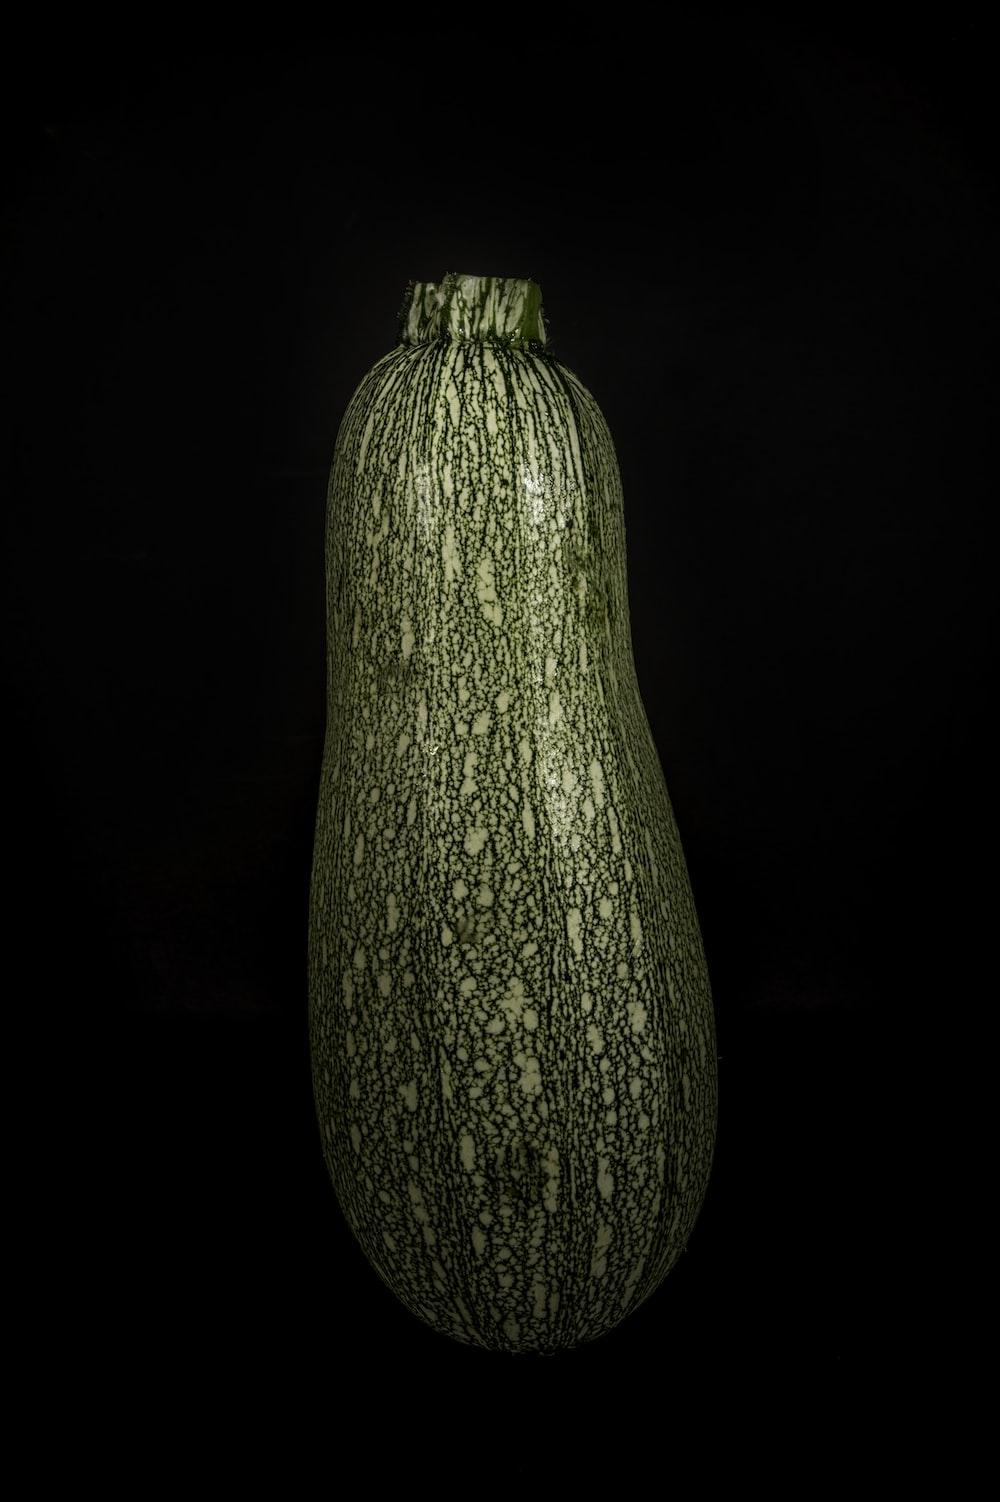 gourd vegetable